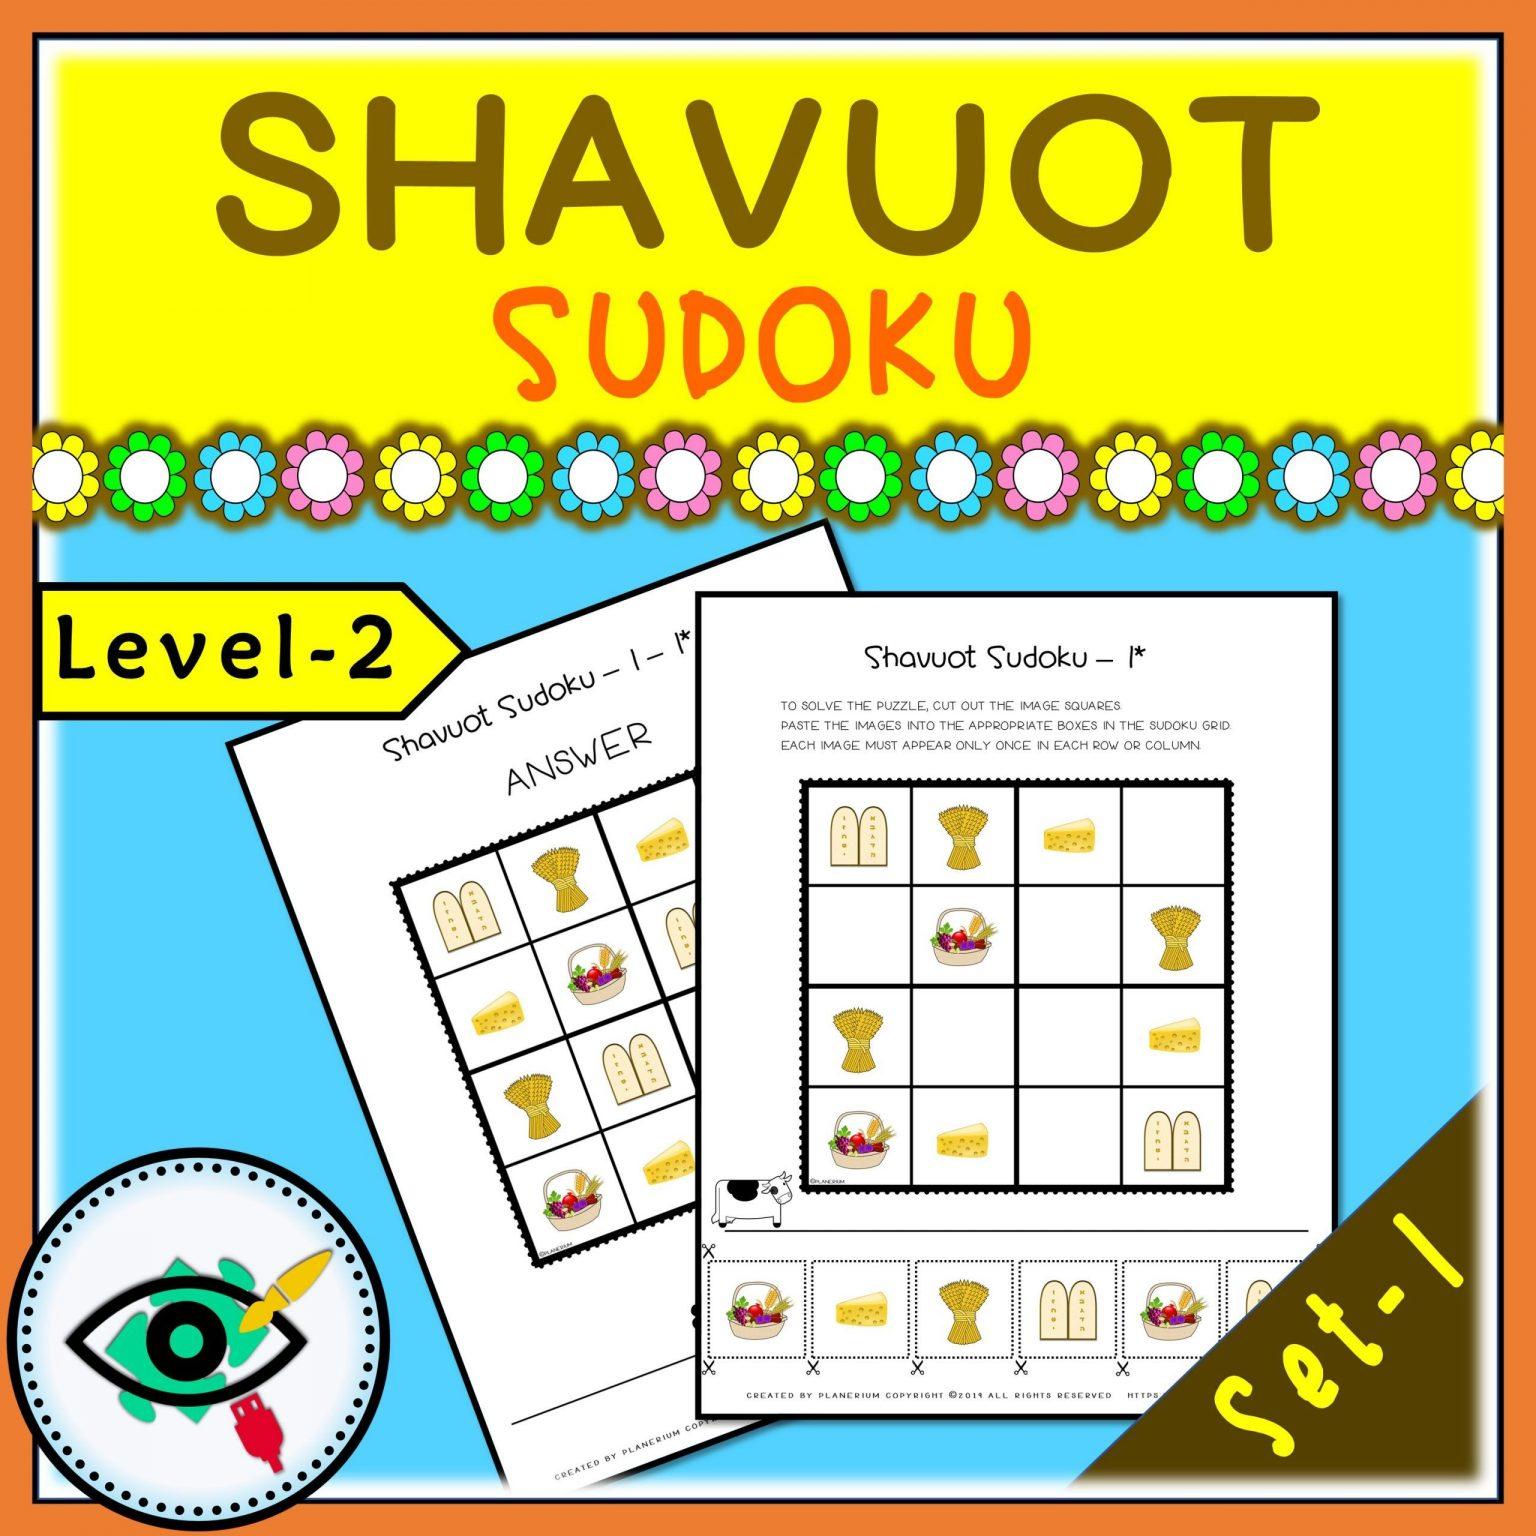 Shavuot - Sudoku Puzzle Game - Title 2